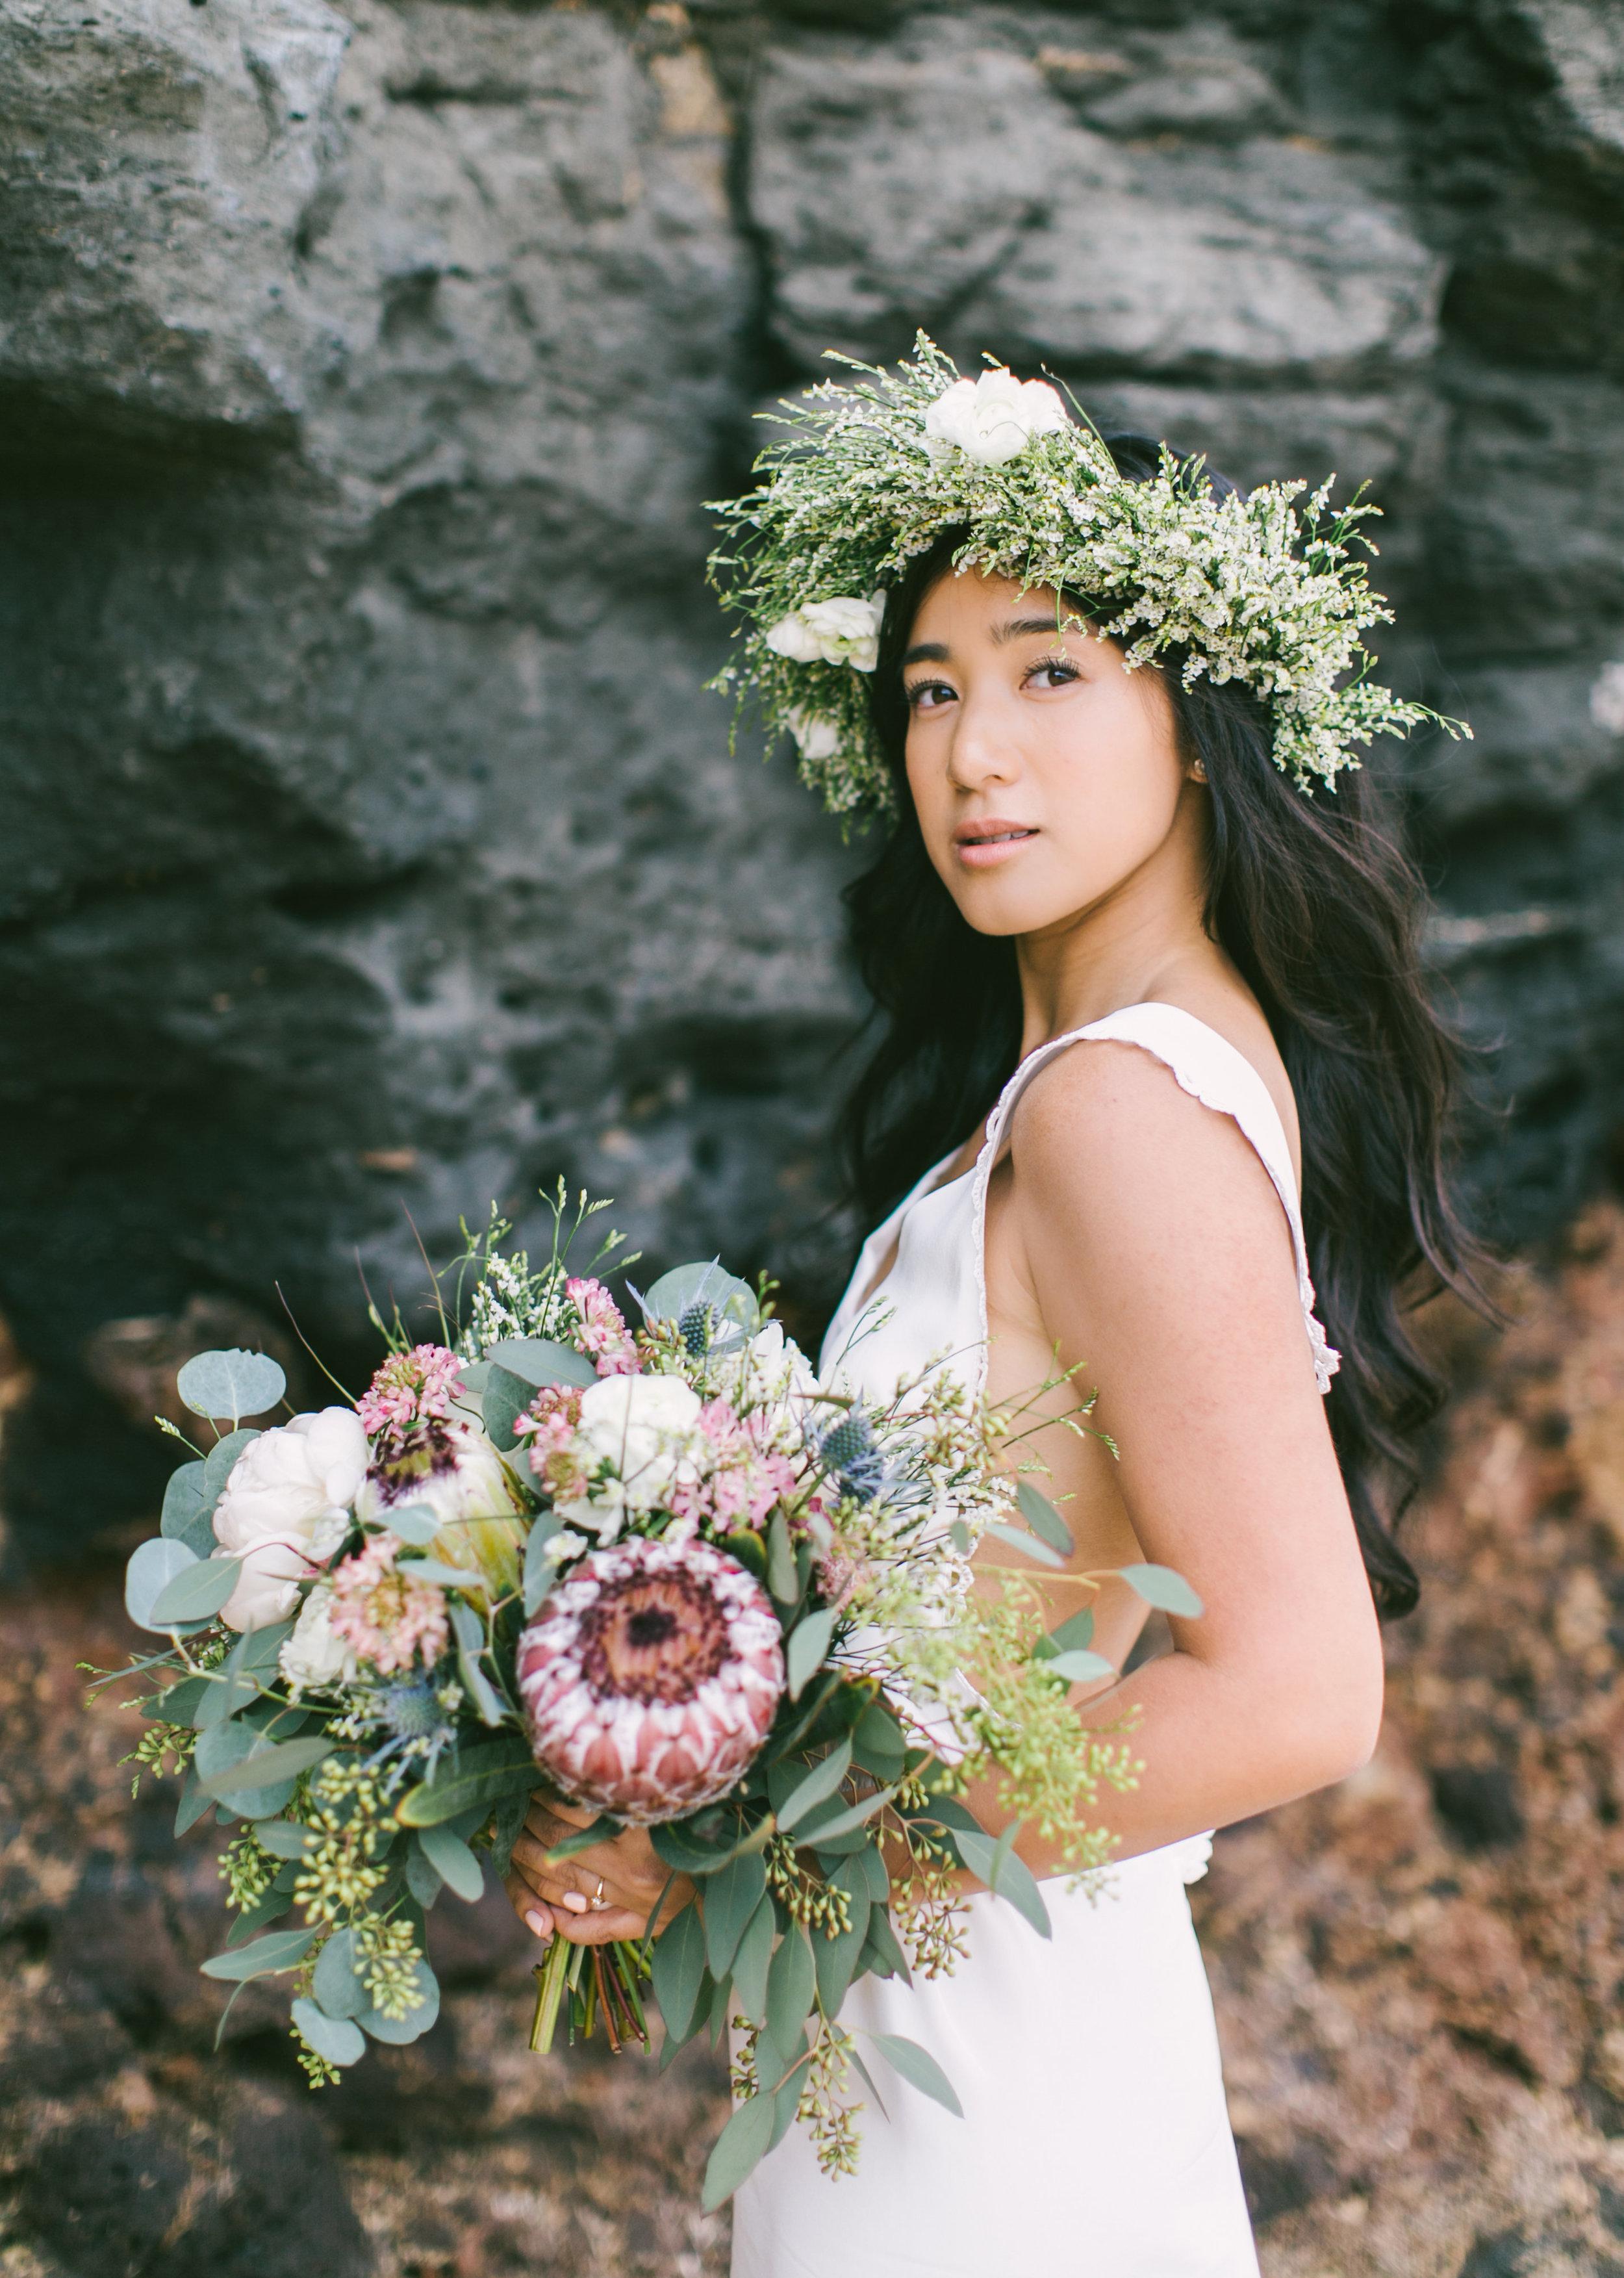 Eucalyptus Protea Bouquet by Passion Roots | Rebecca Arthurs Photography | Oahu, Hawaii